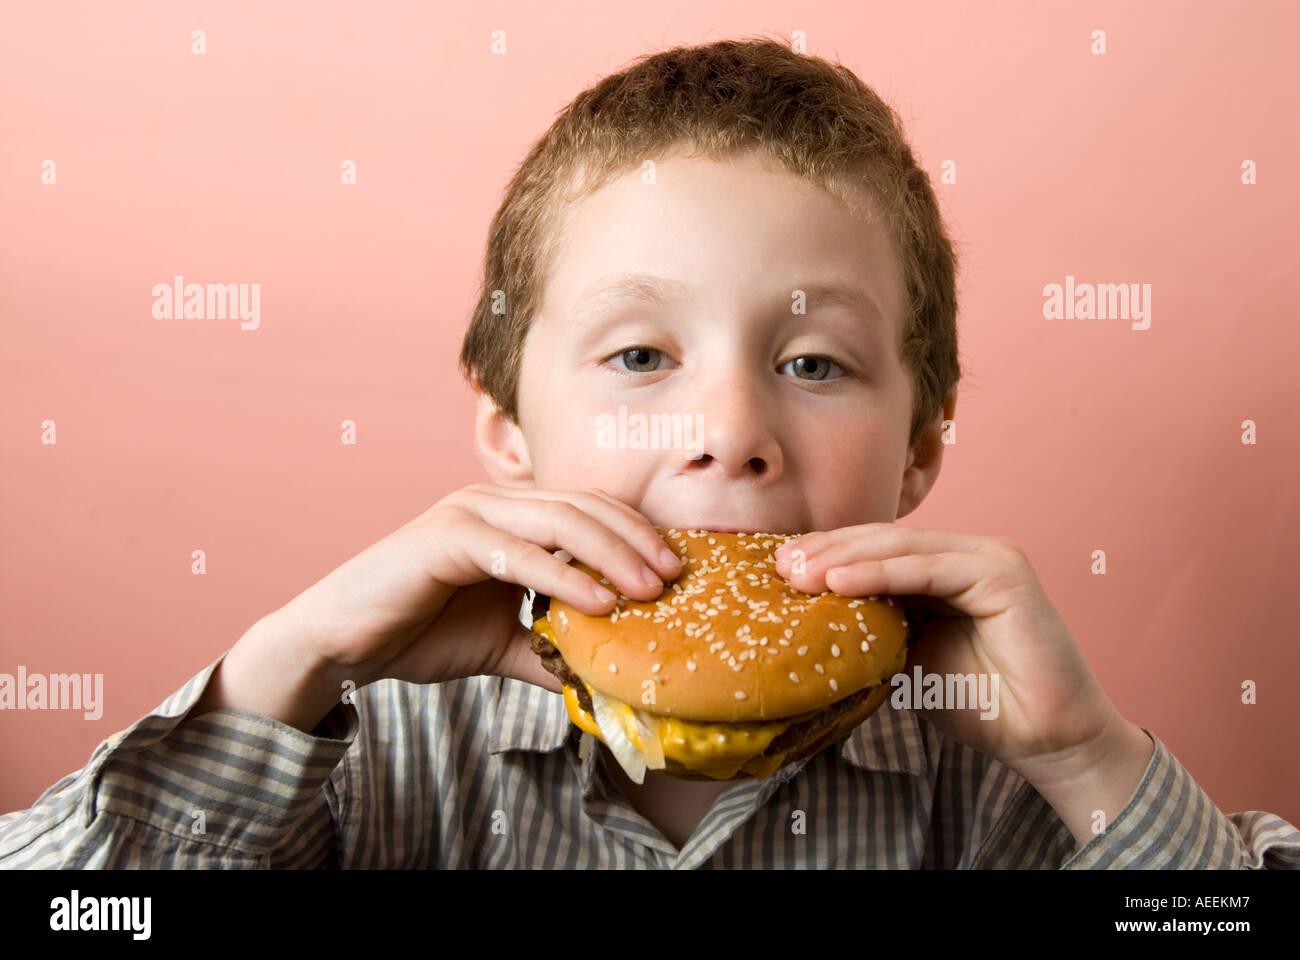 Boy eating McDonald's burger, England, UK - Stock Image